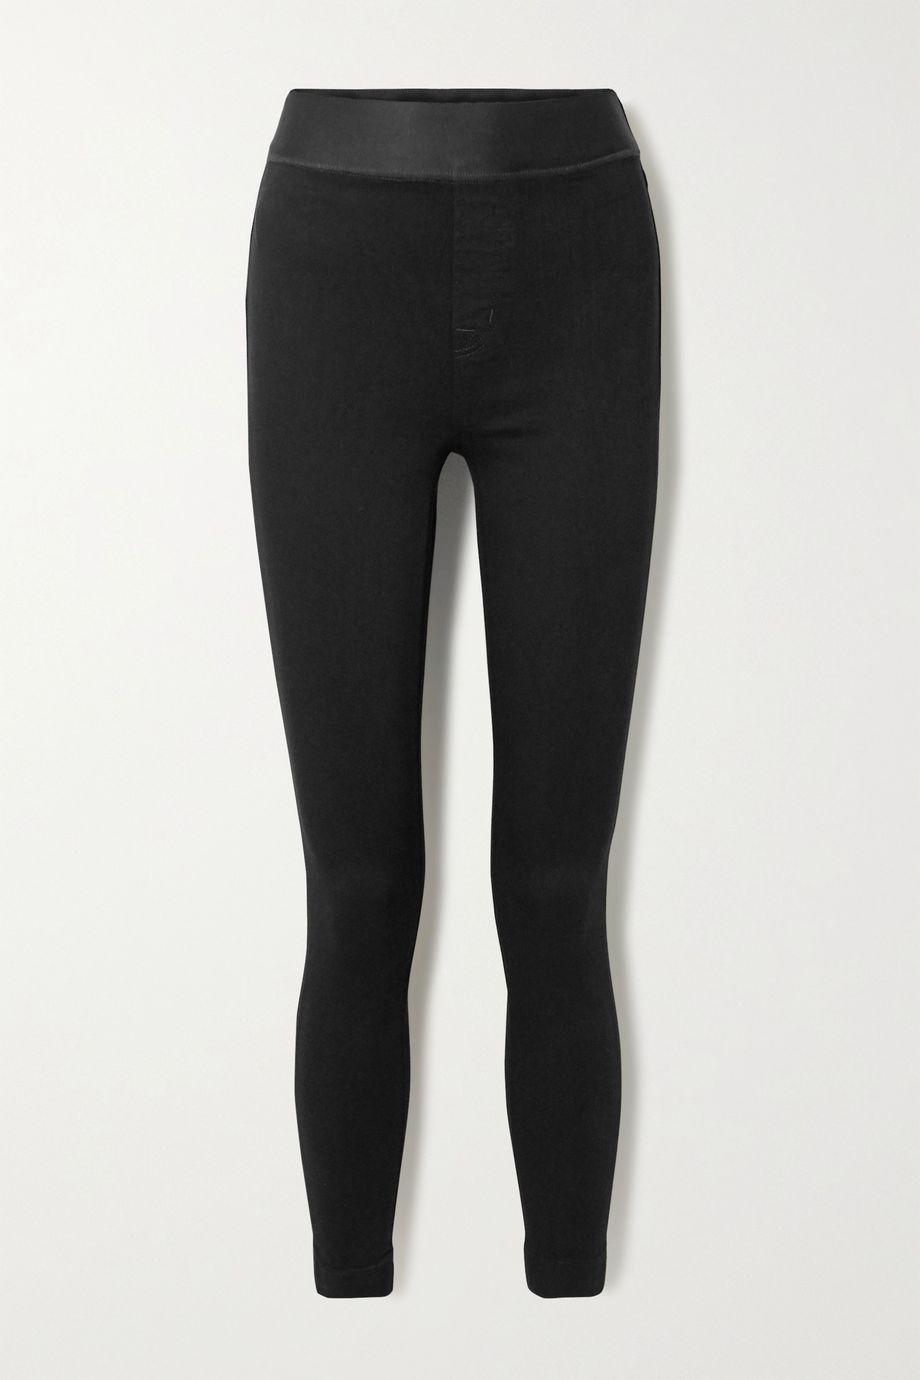 J Brand Dellah high-rise skinny jeans